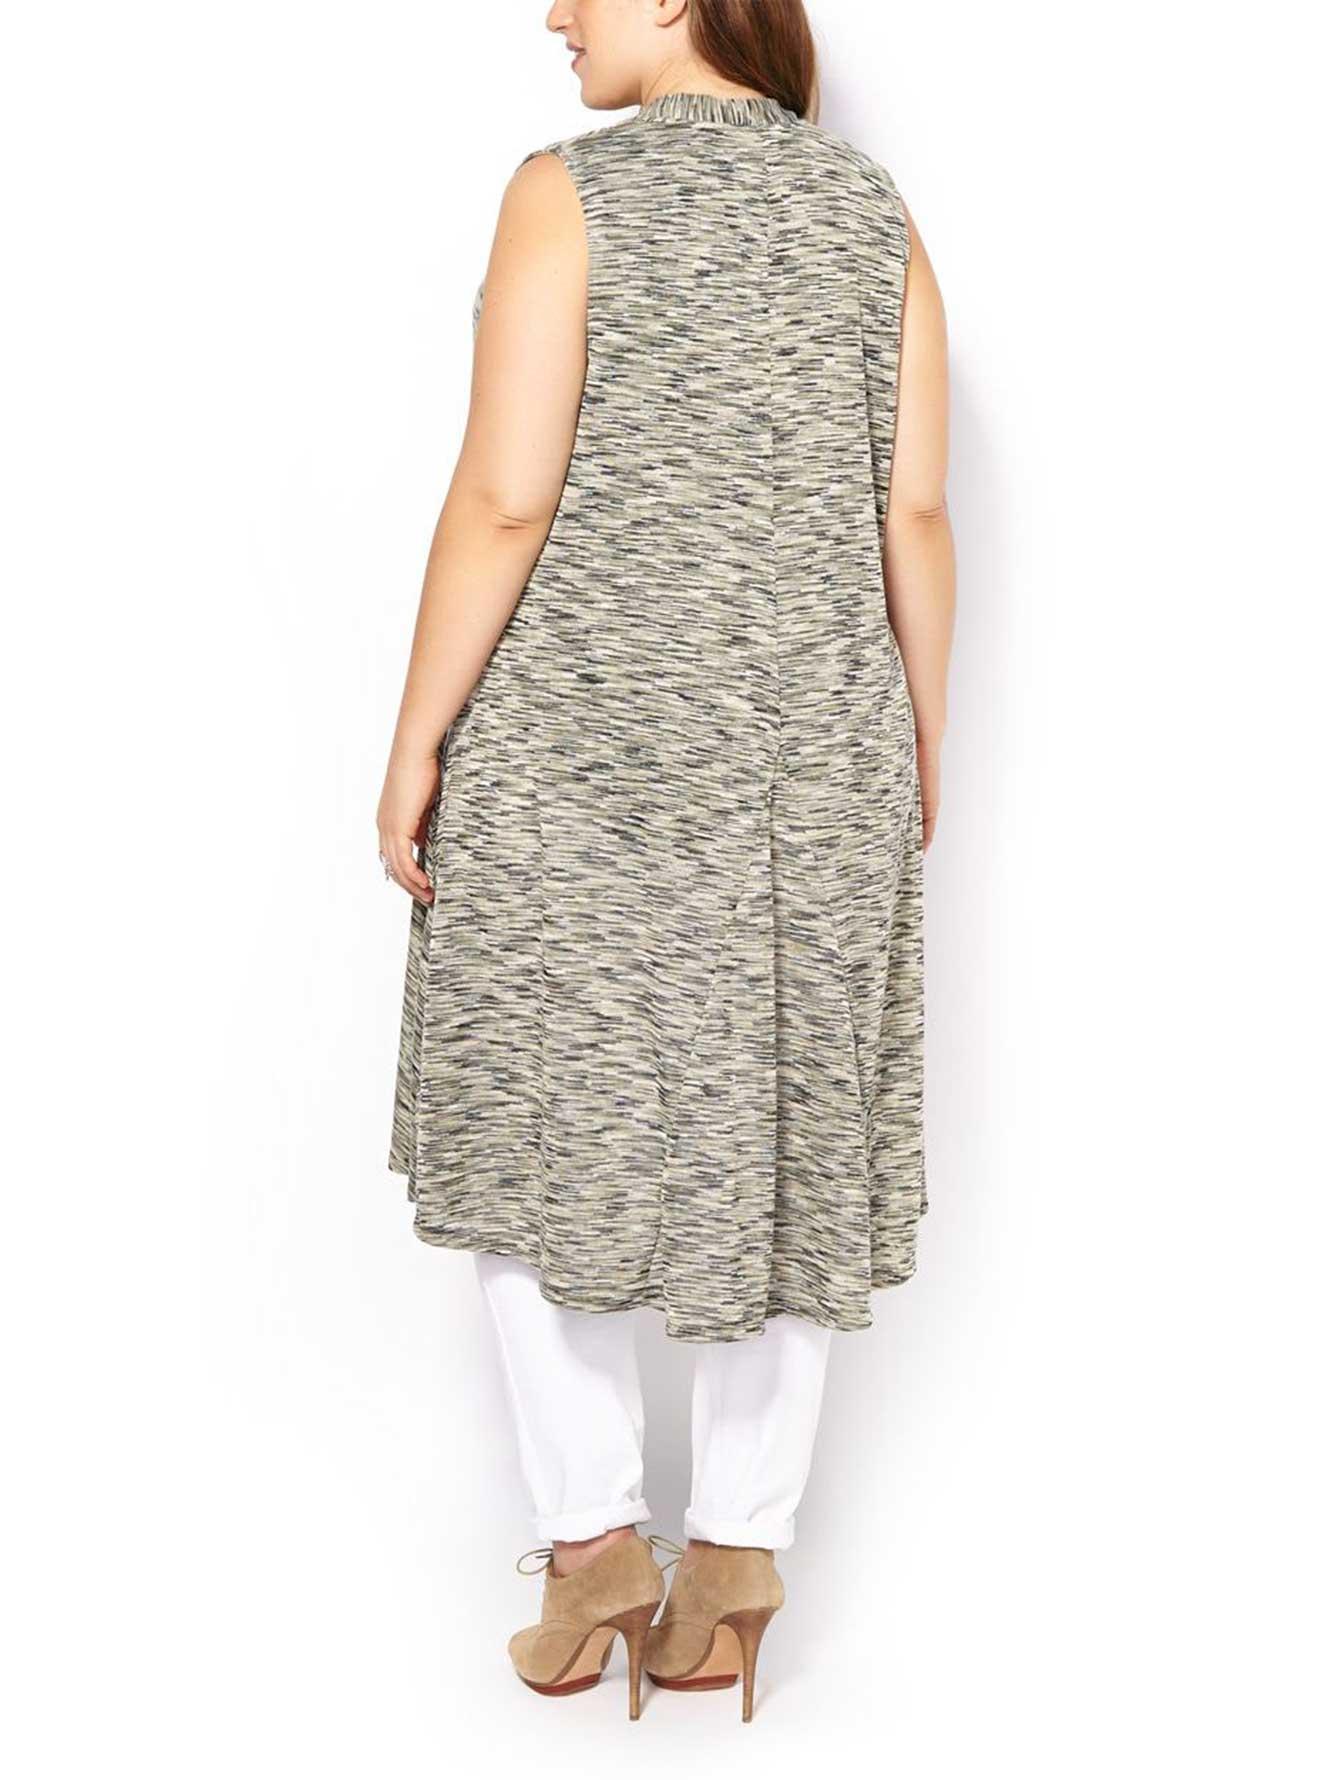 Sleeveless Cardigan Knitting Pattern : Sleeveless Knit Cardigan Penningtons